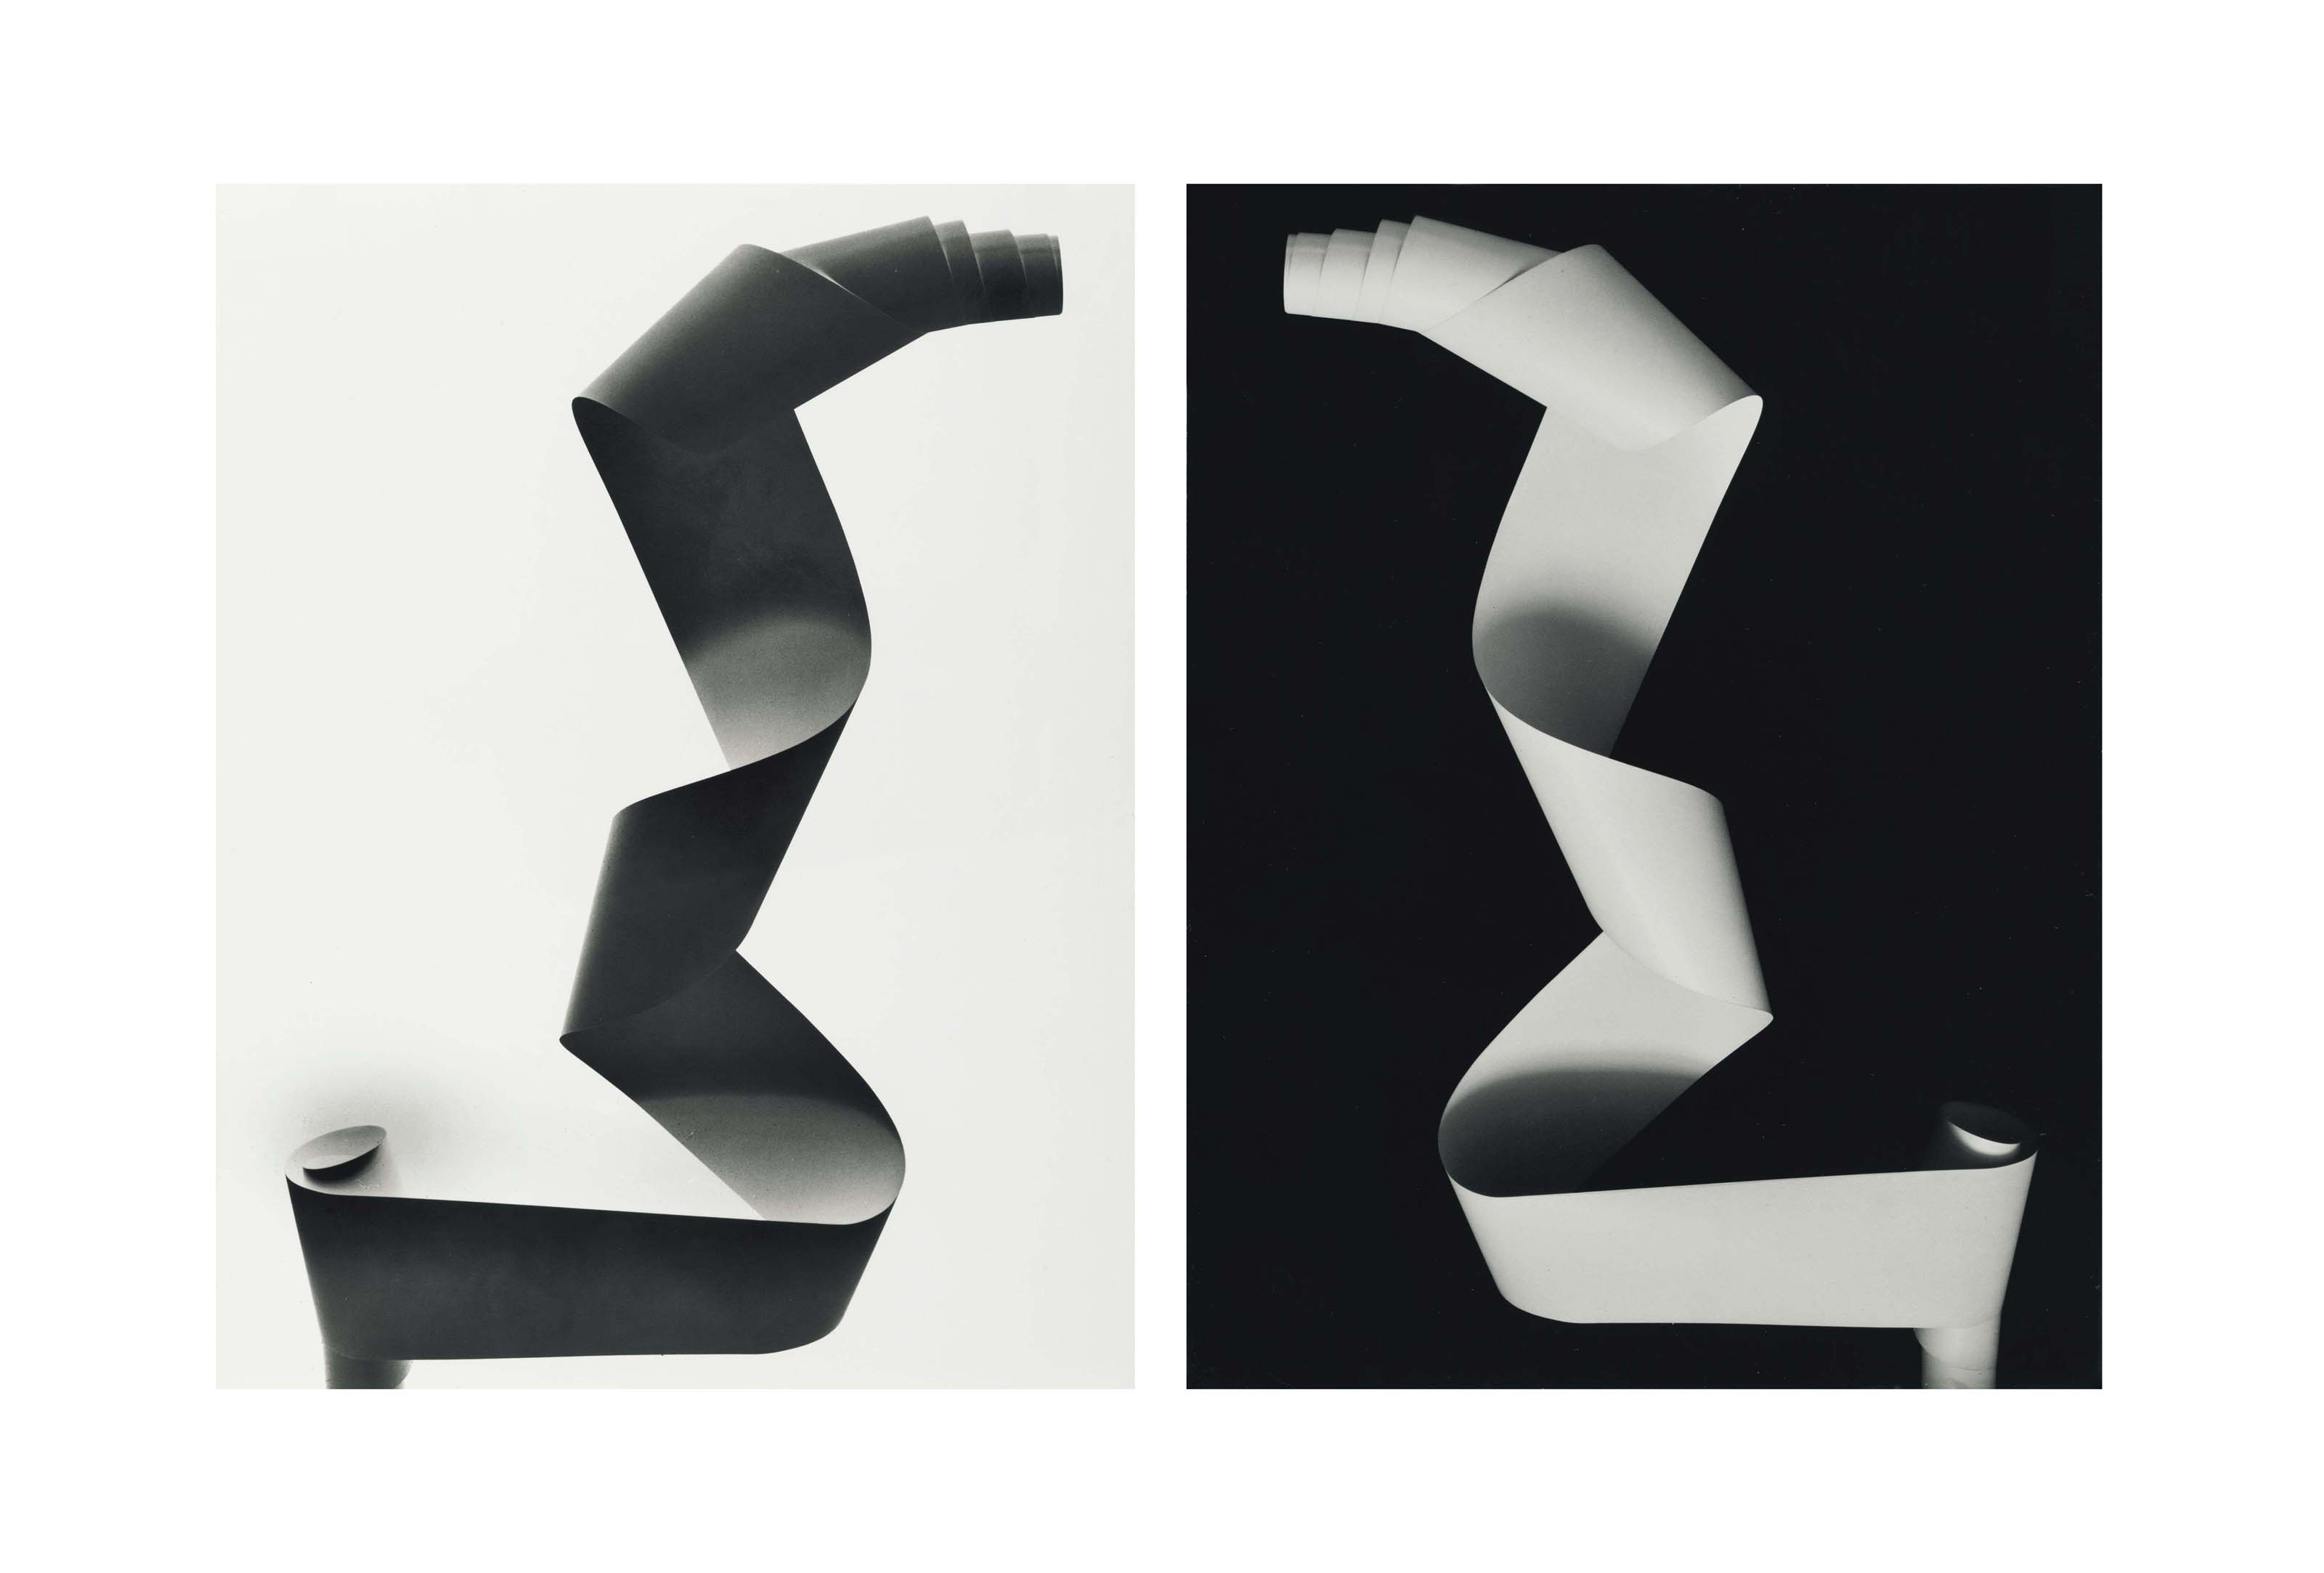 White Paper-Roll, Negative et White Paper-Roll, Positive , 1938